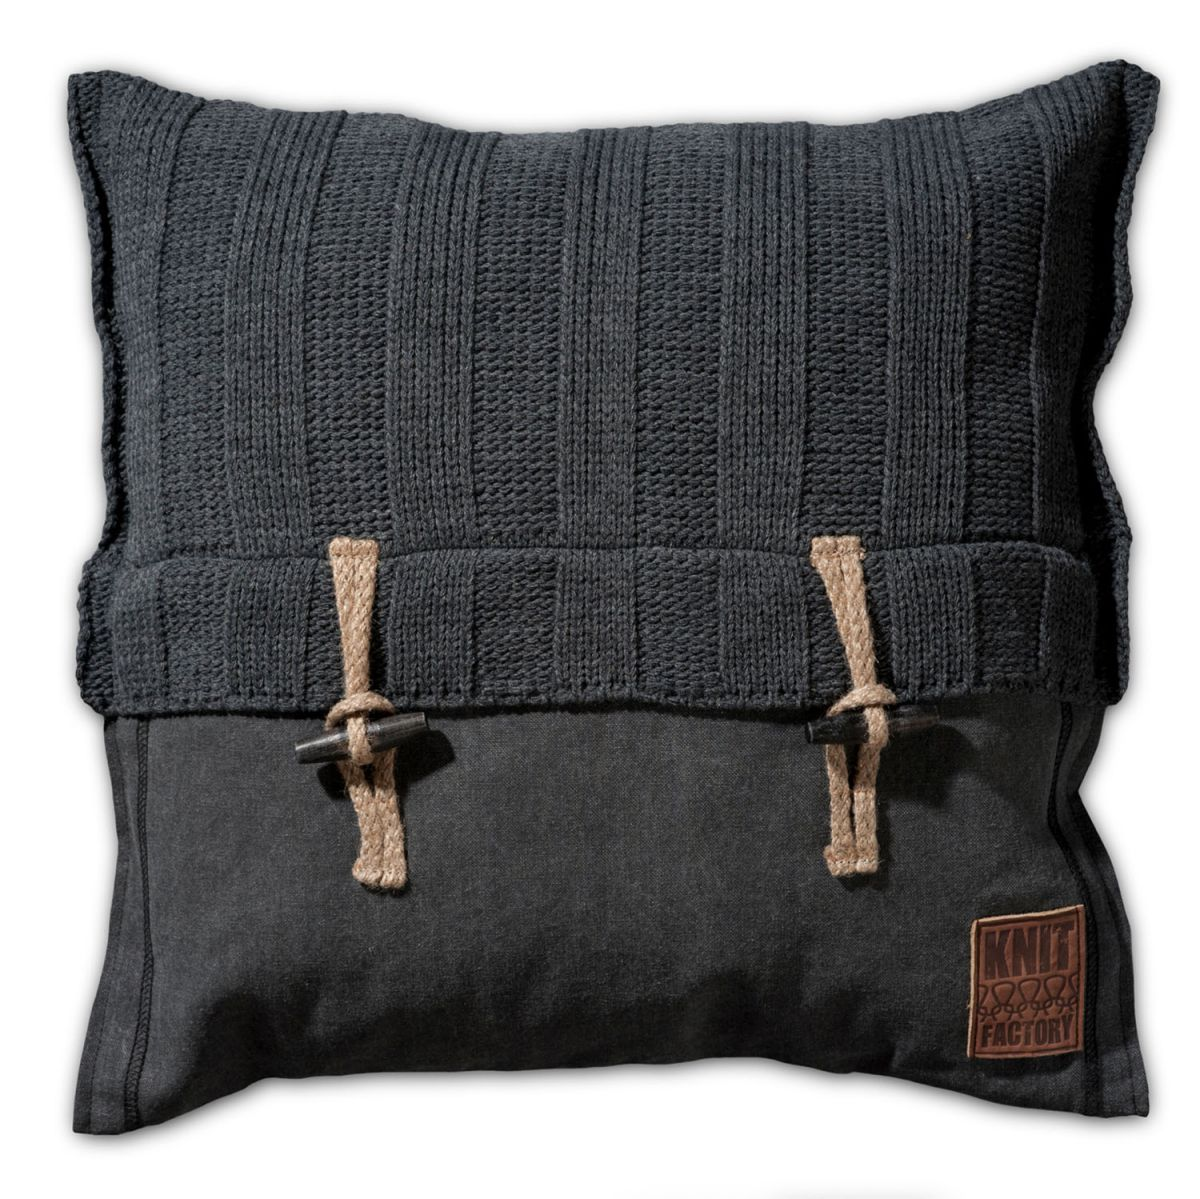 knit factory 1121210 kussen 50x50 6x6 rib antraciet 1